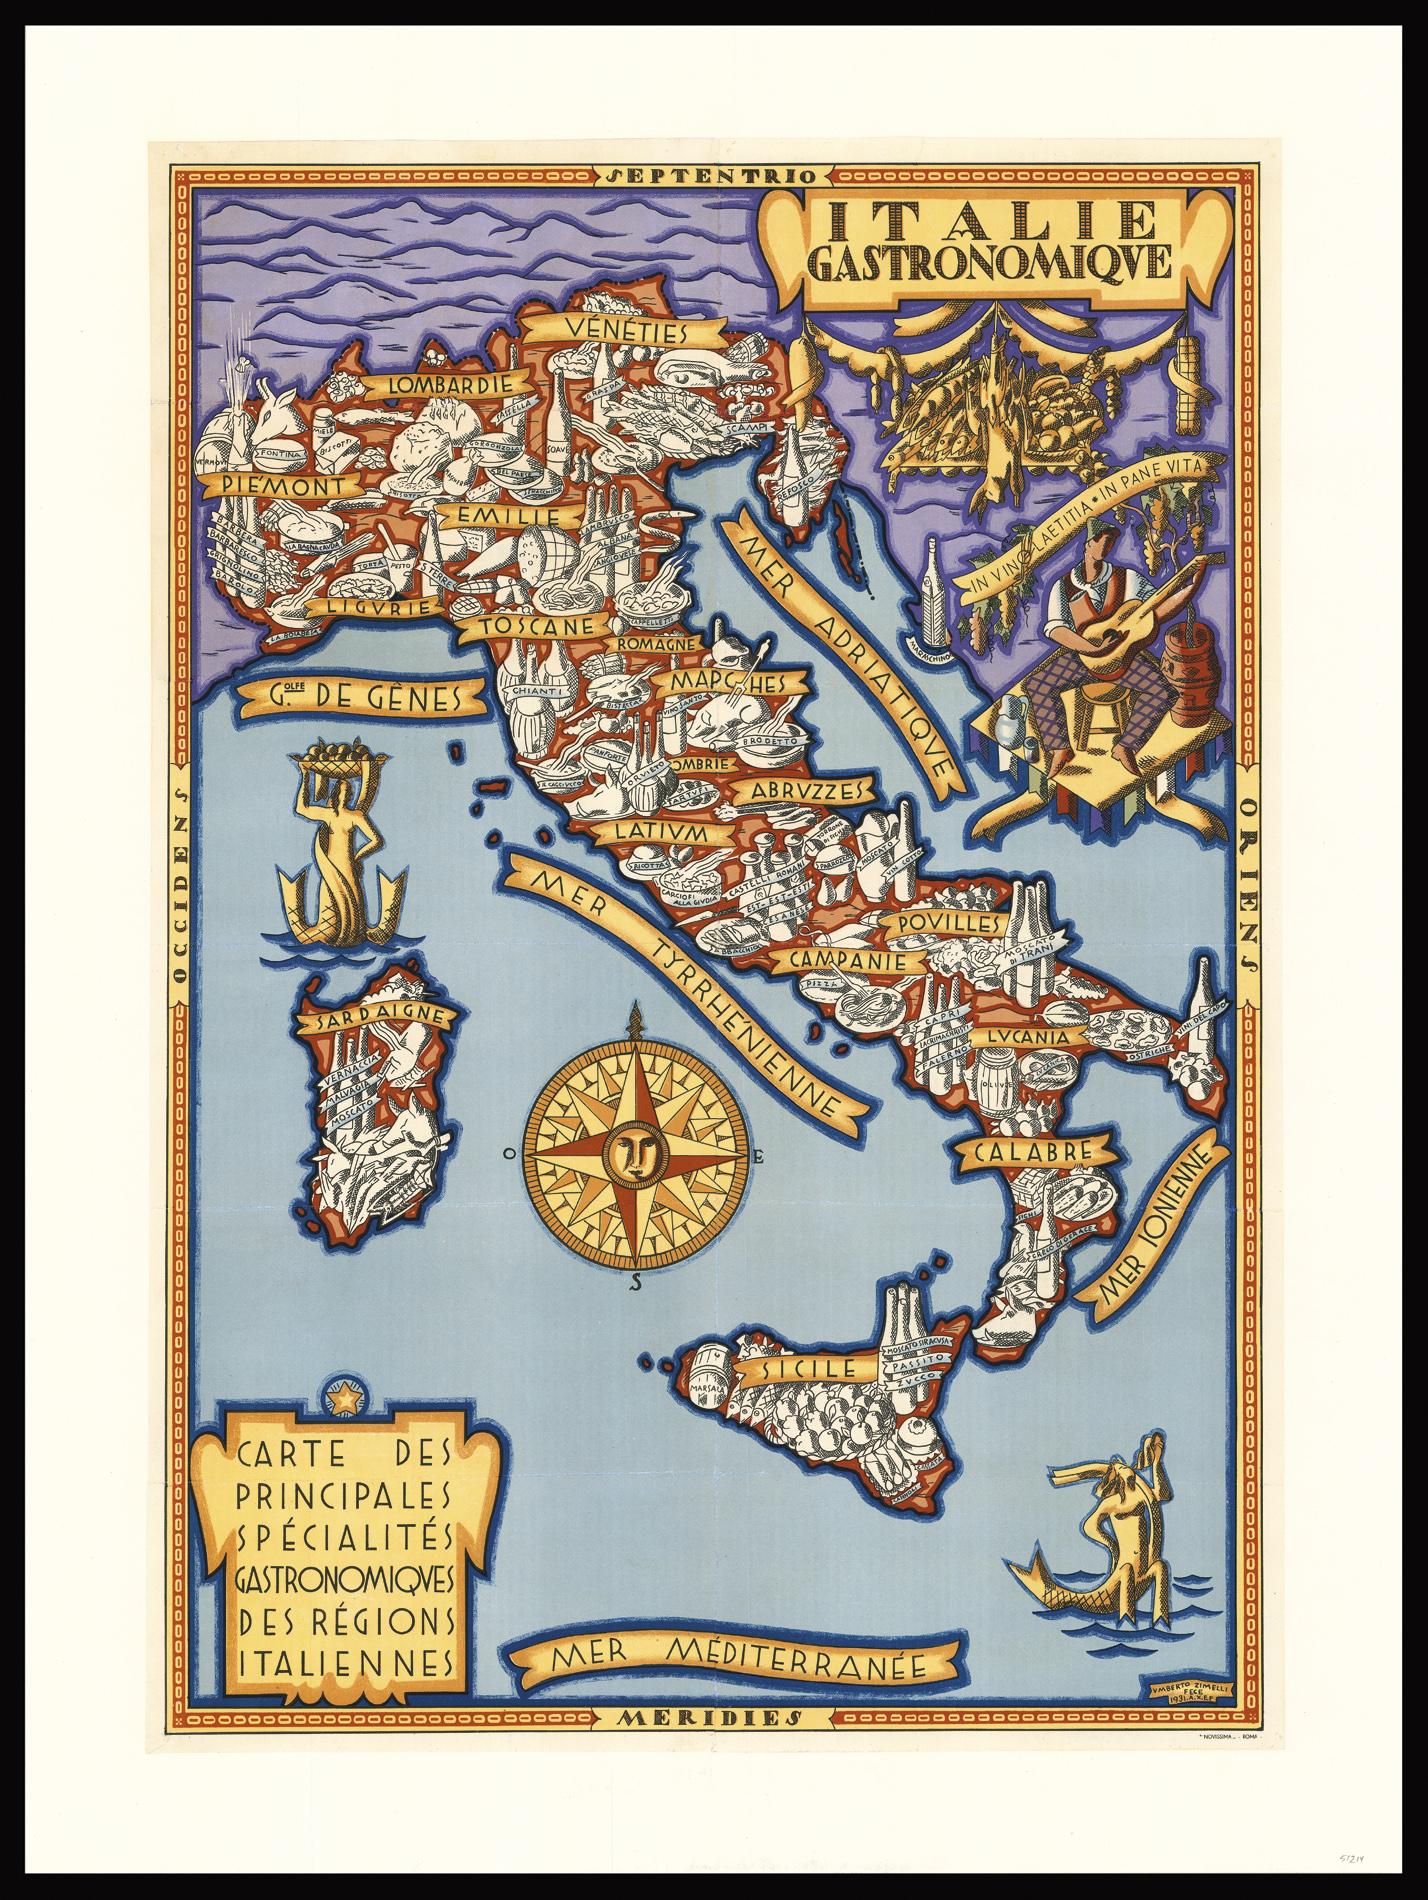 Italie Gastronomique Carte Des Principales Specialites Gastronomiques Des Regions Italiennes By Zimelli Umberto 1931 Map Daniel Crouch Rare Books Llp